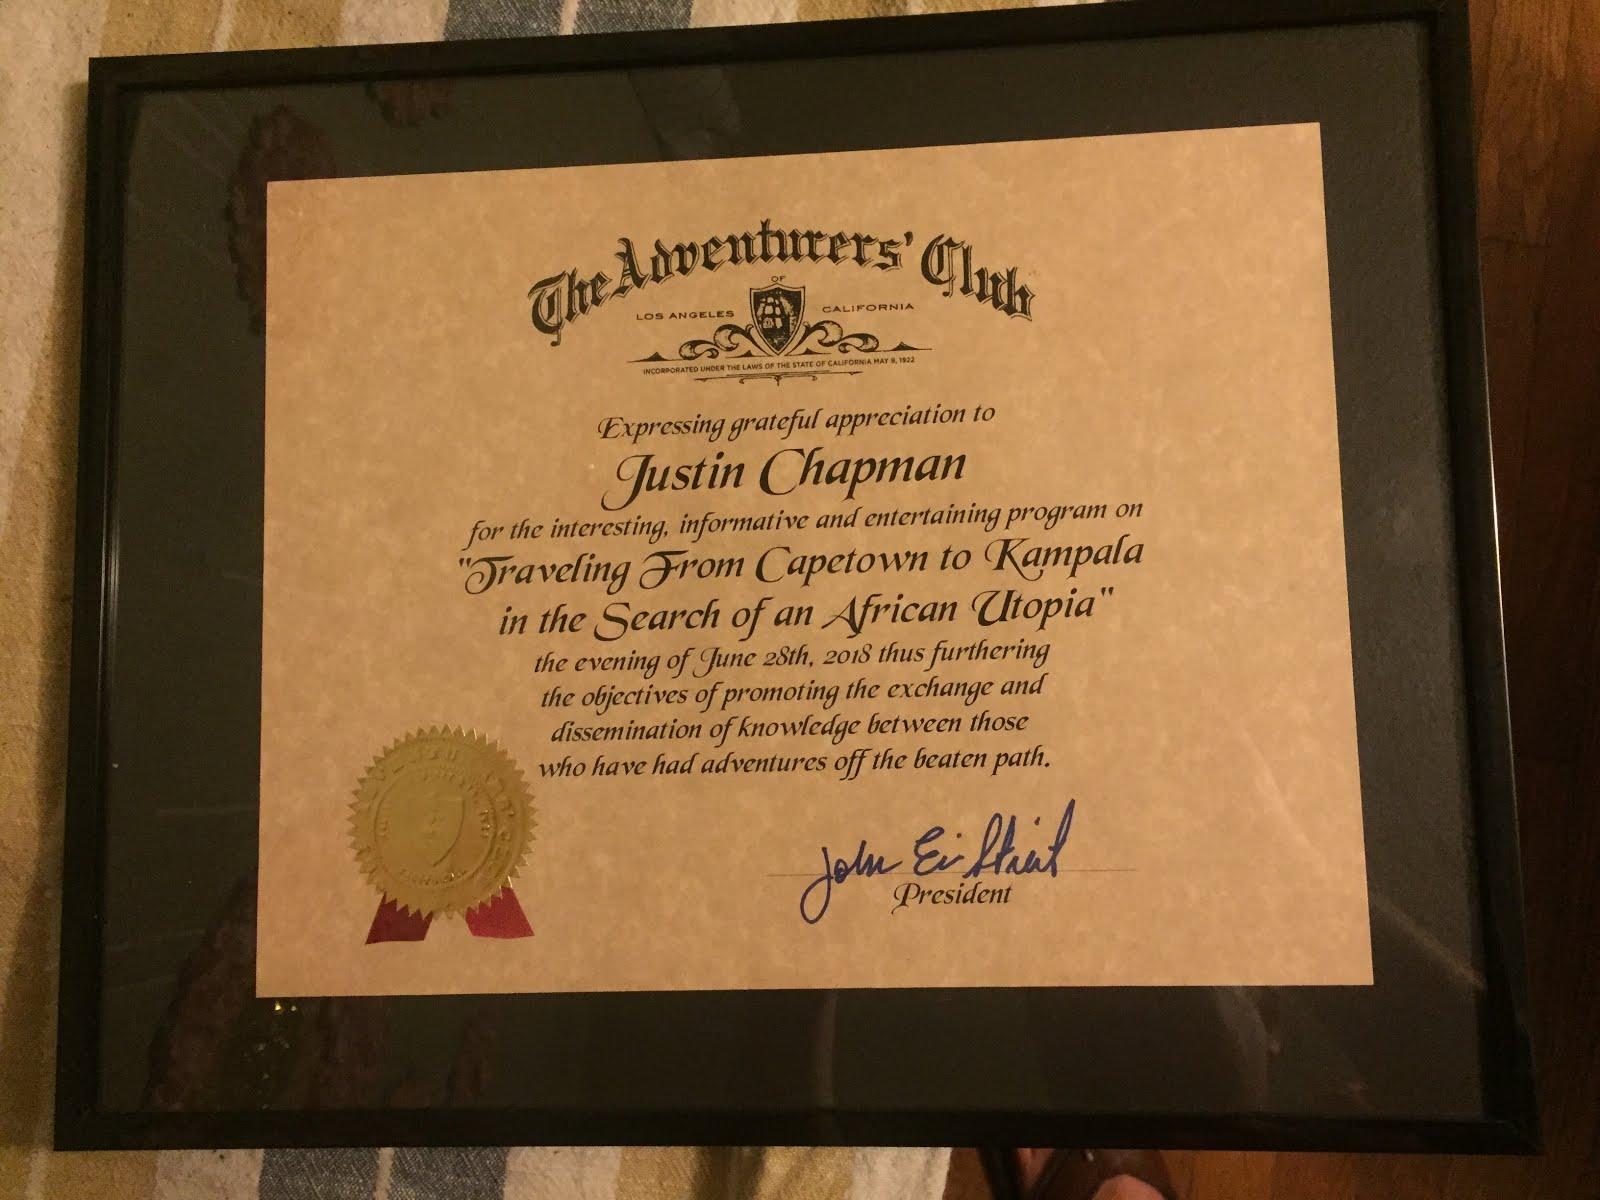 Adventurers Club of Los Angeles